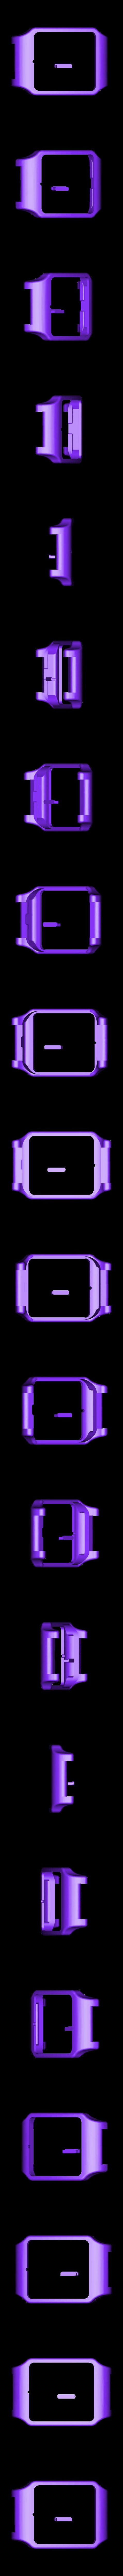 part8a_22_but.stl Download STL file sony smartwatch 3 holder • 3D printable design, MZTutto3D